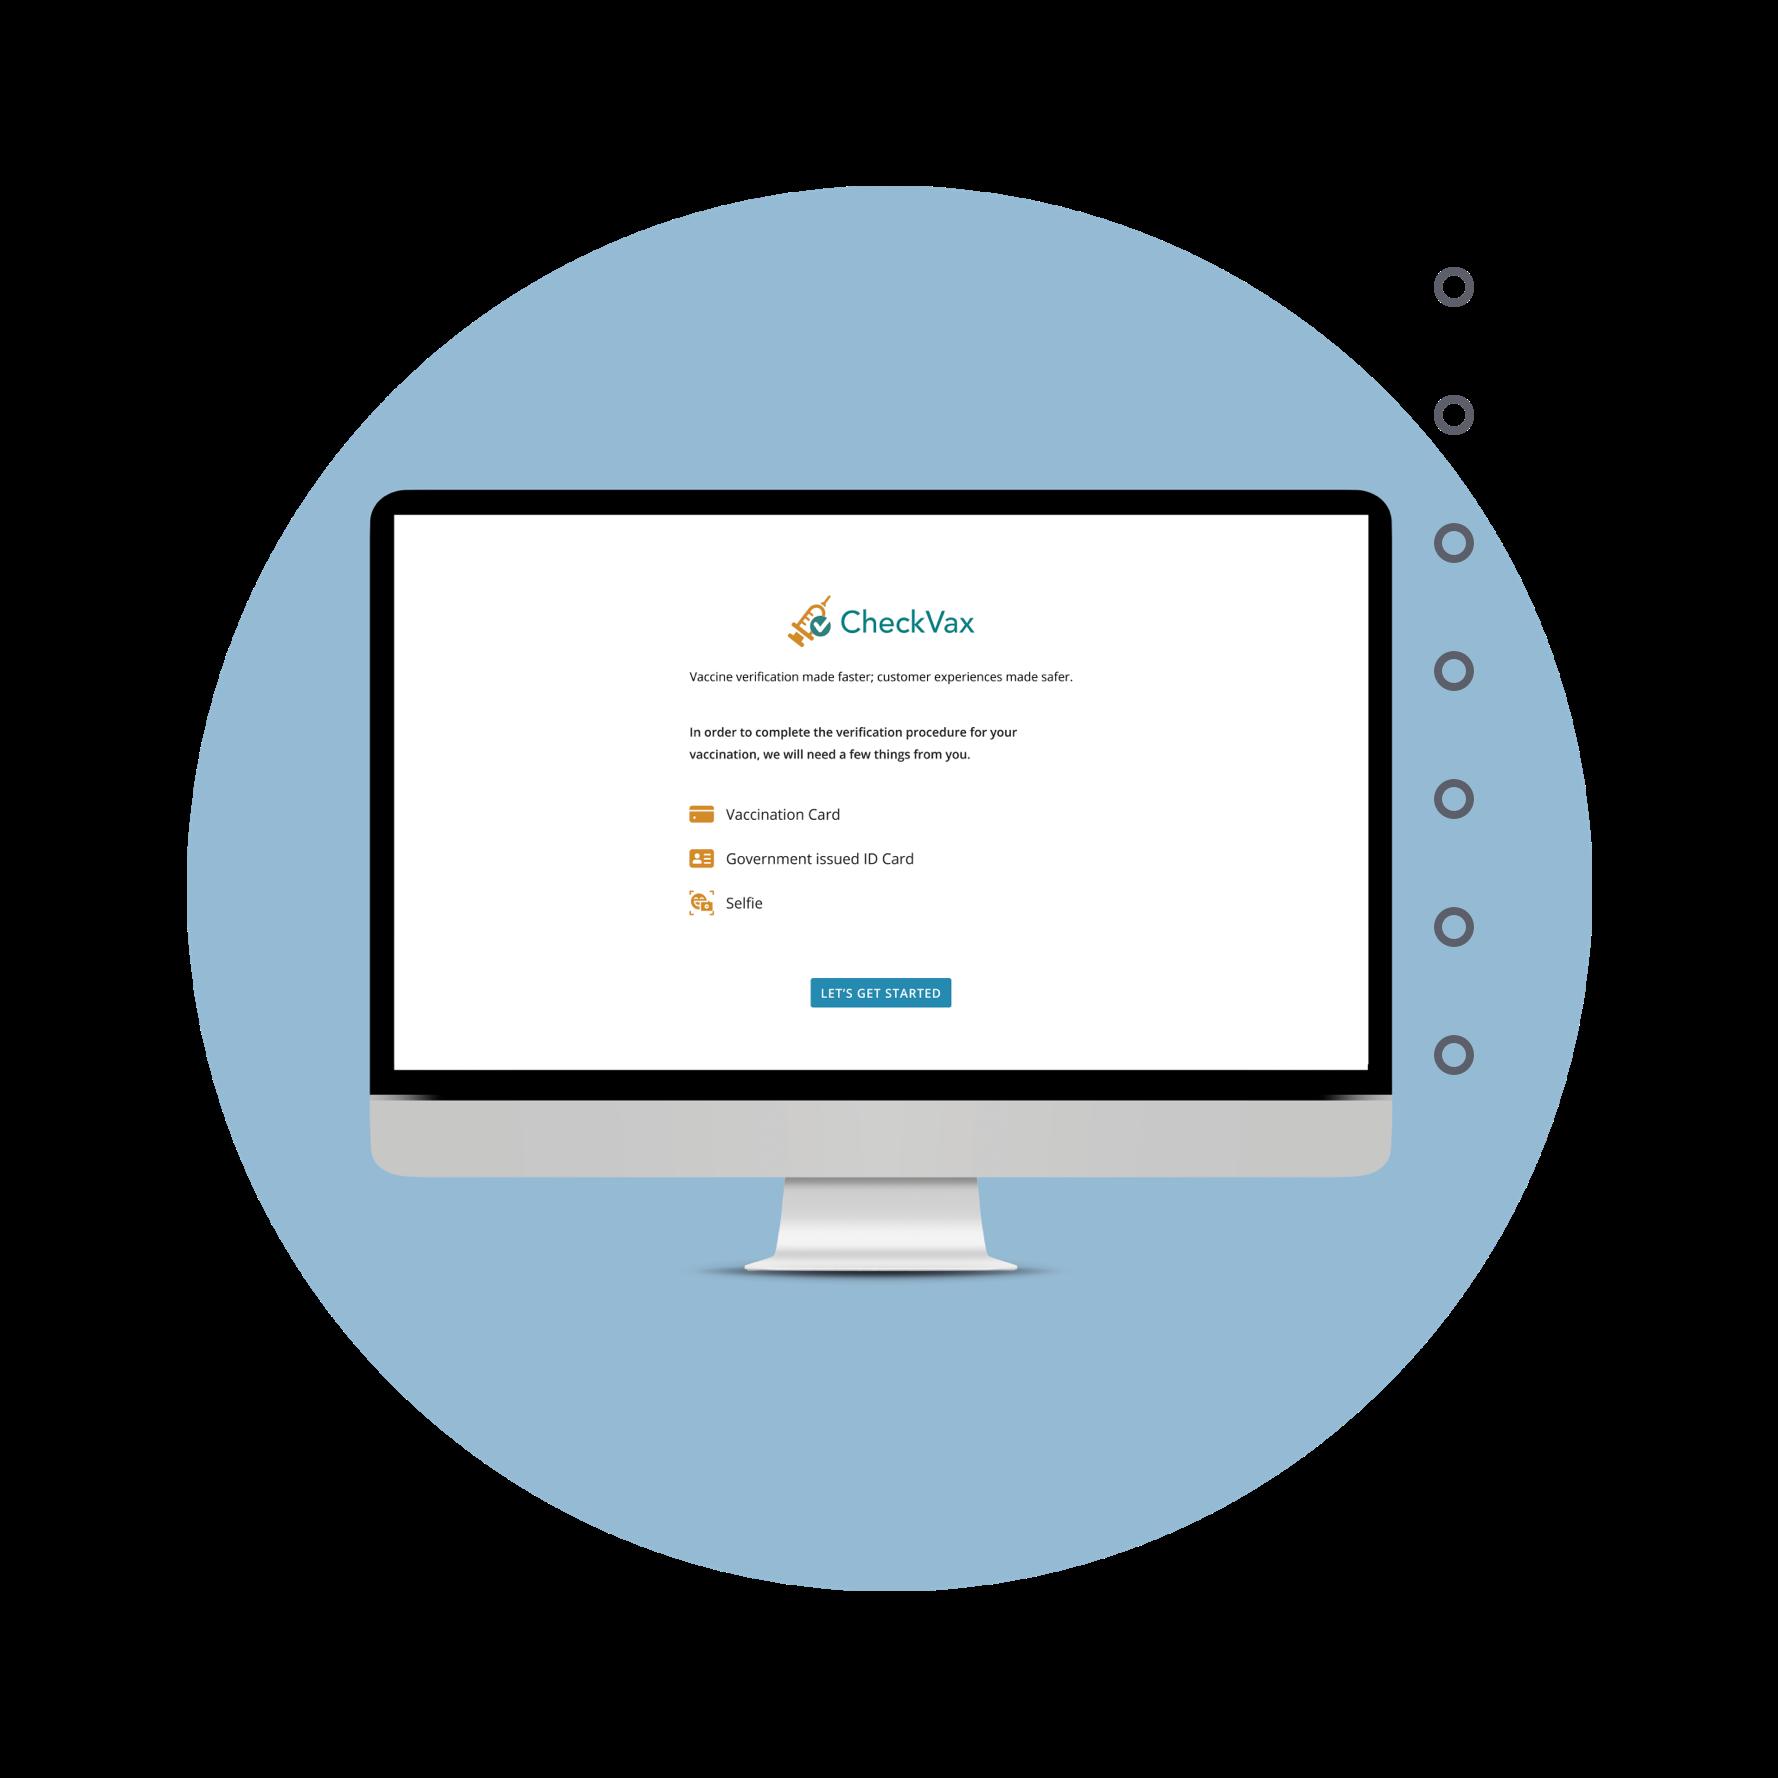 CheckVax webimage